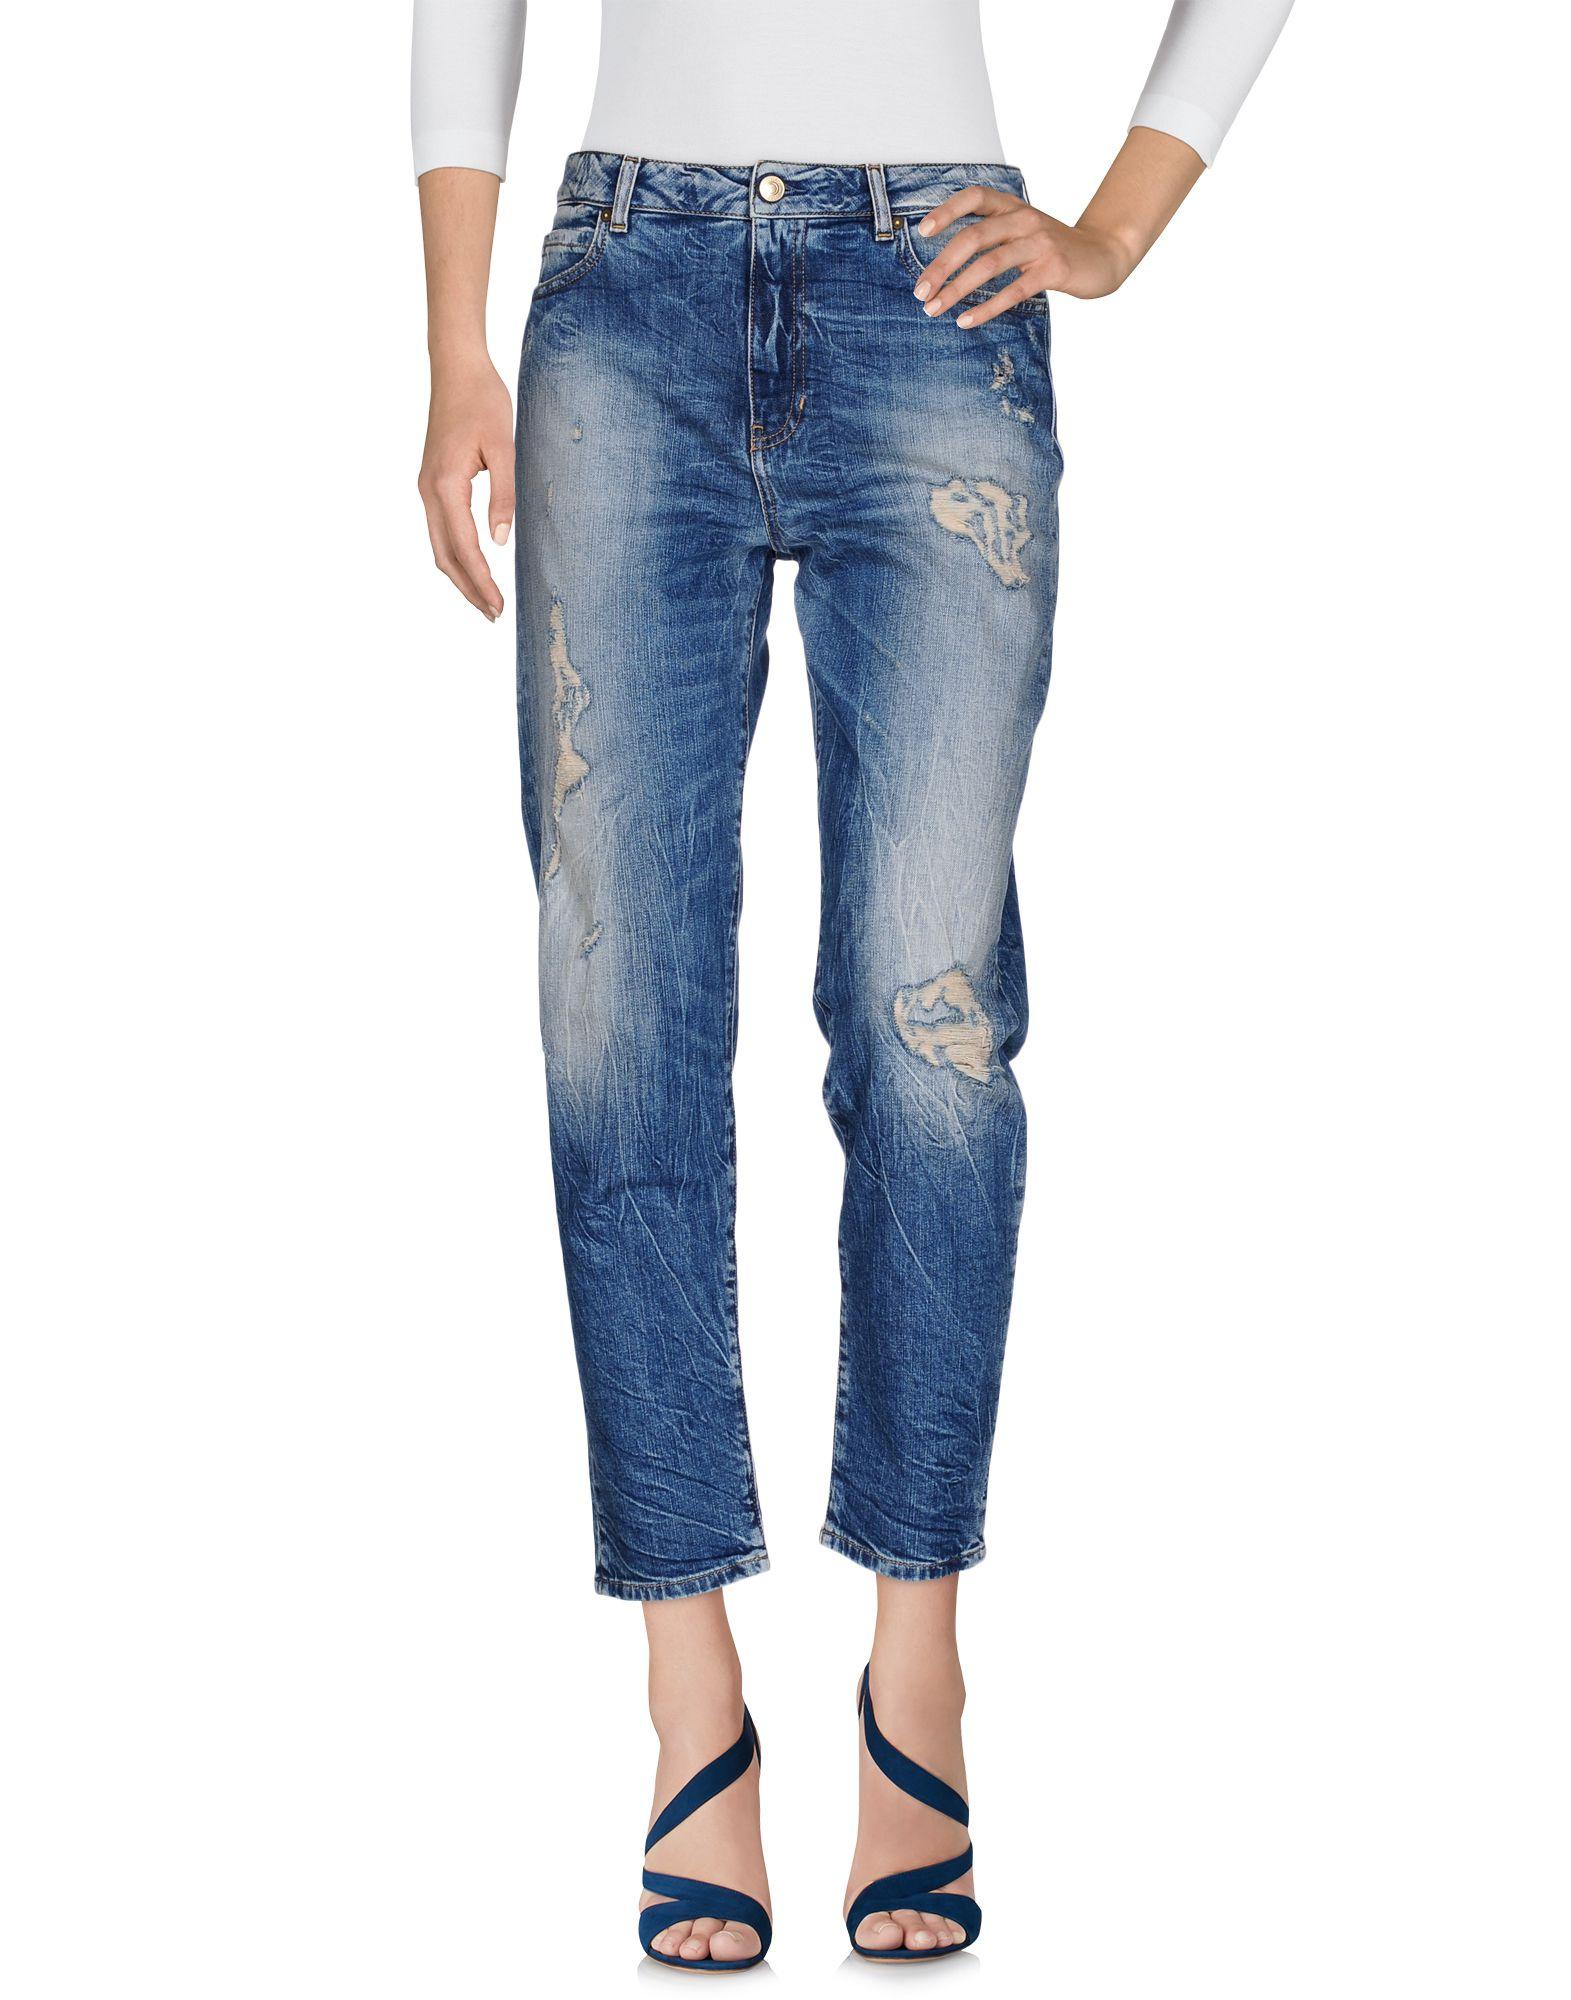 GUESS Damen Jeanshose8 blau